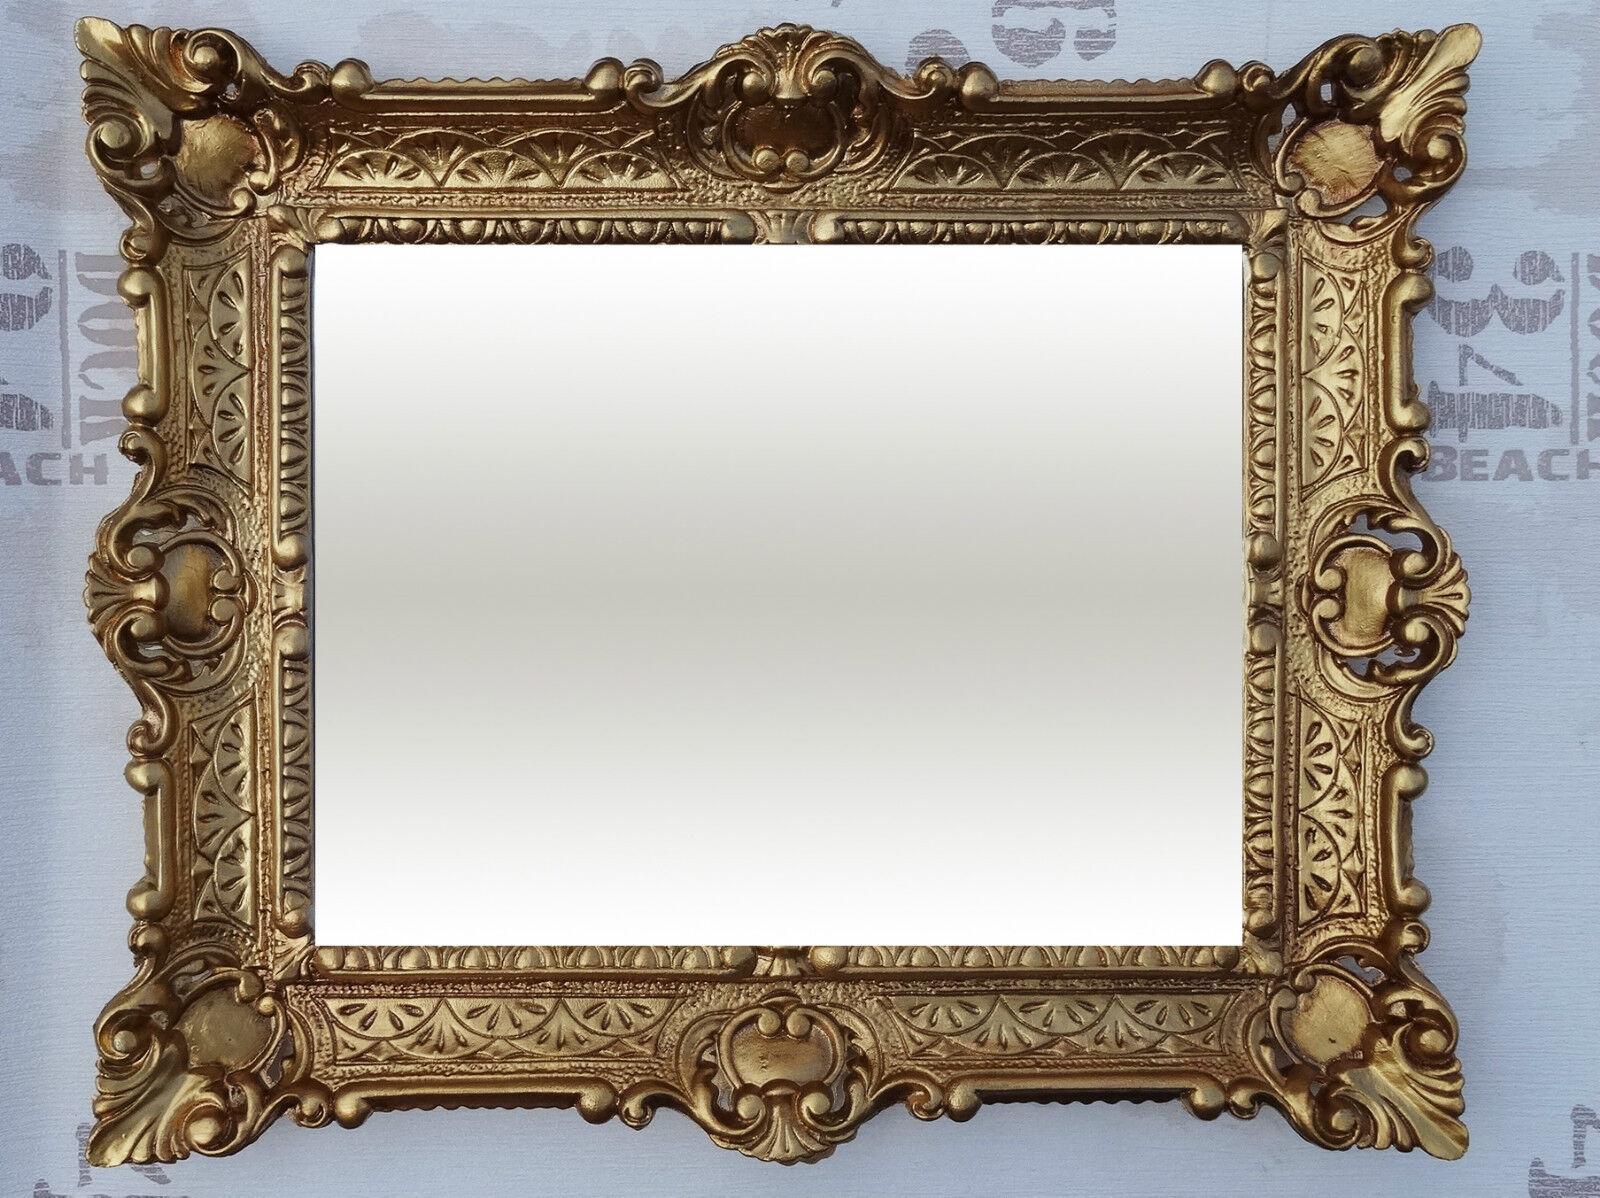 bilderrahmen fotorahmen 56x46 antik barock replikate rechteckig barockrahmen neu eur 39 90. Black Bedroom Furniture Sets. Home Design Ideas